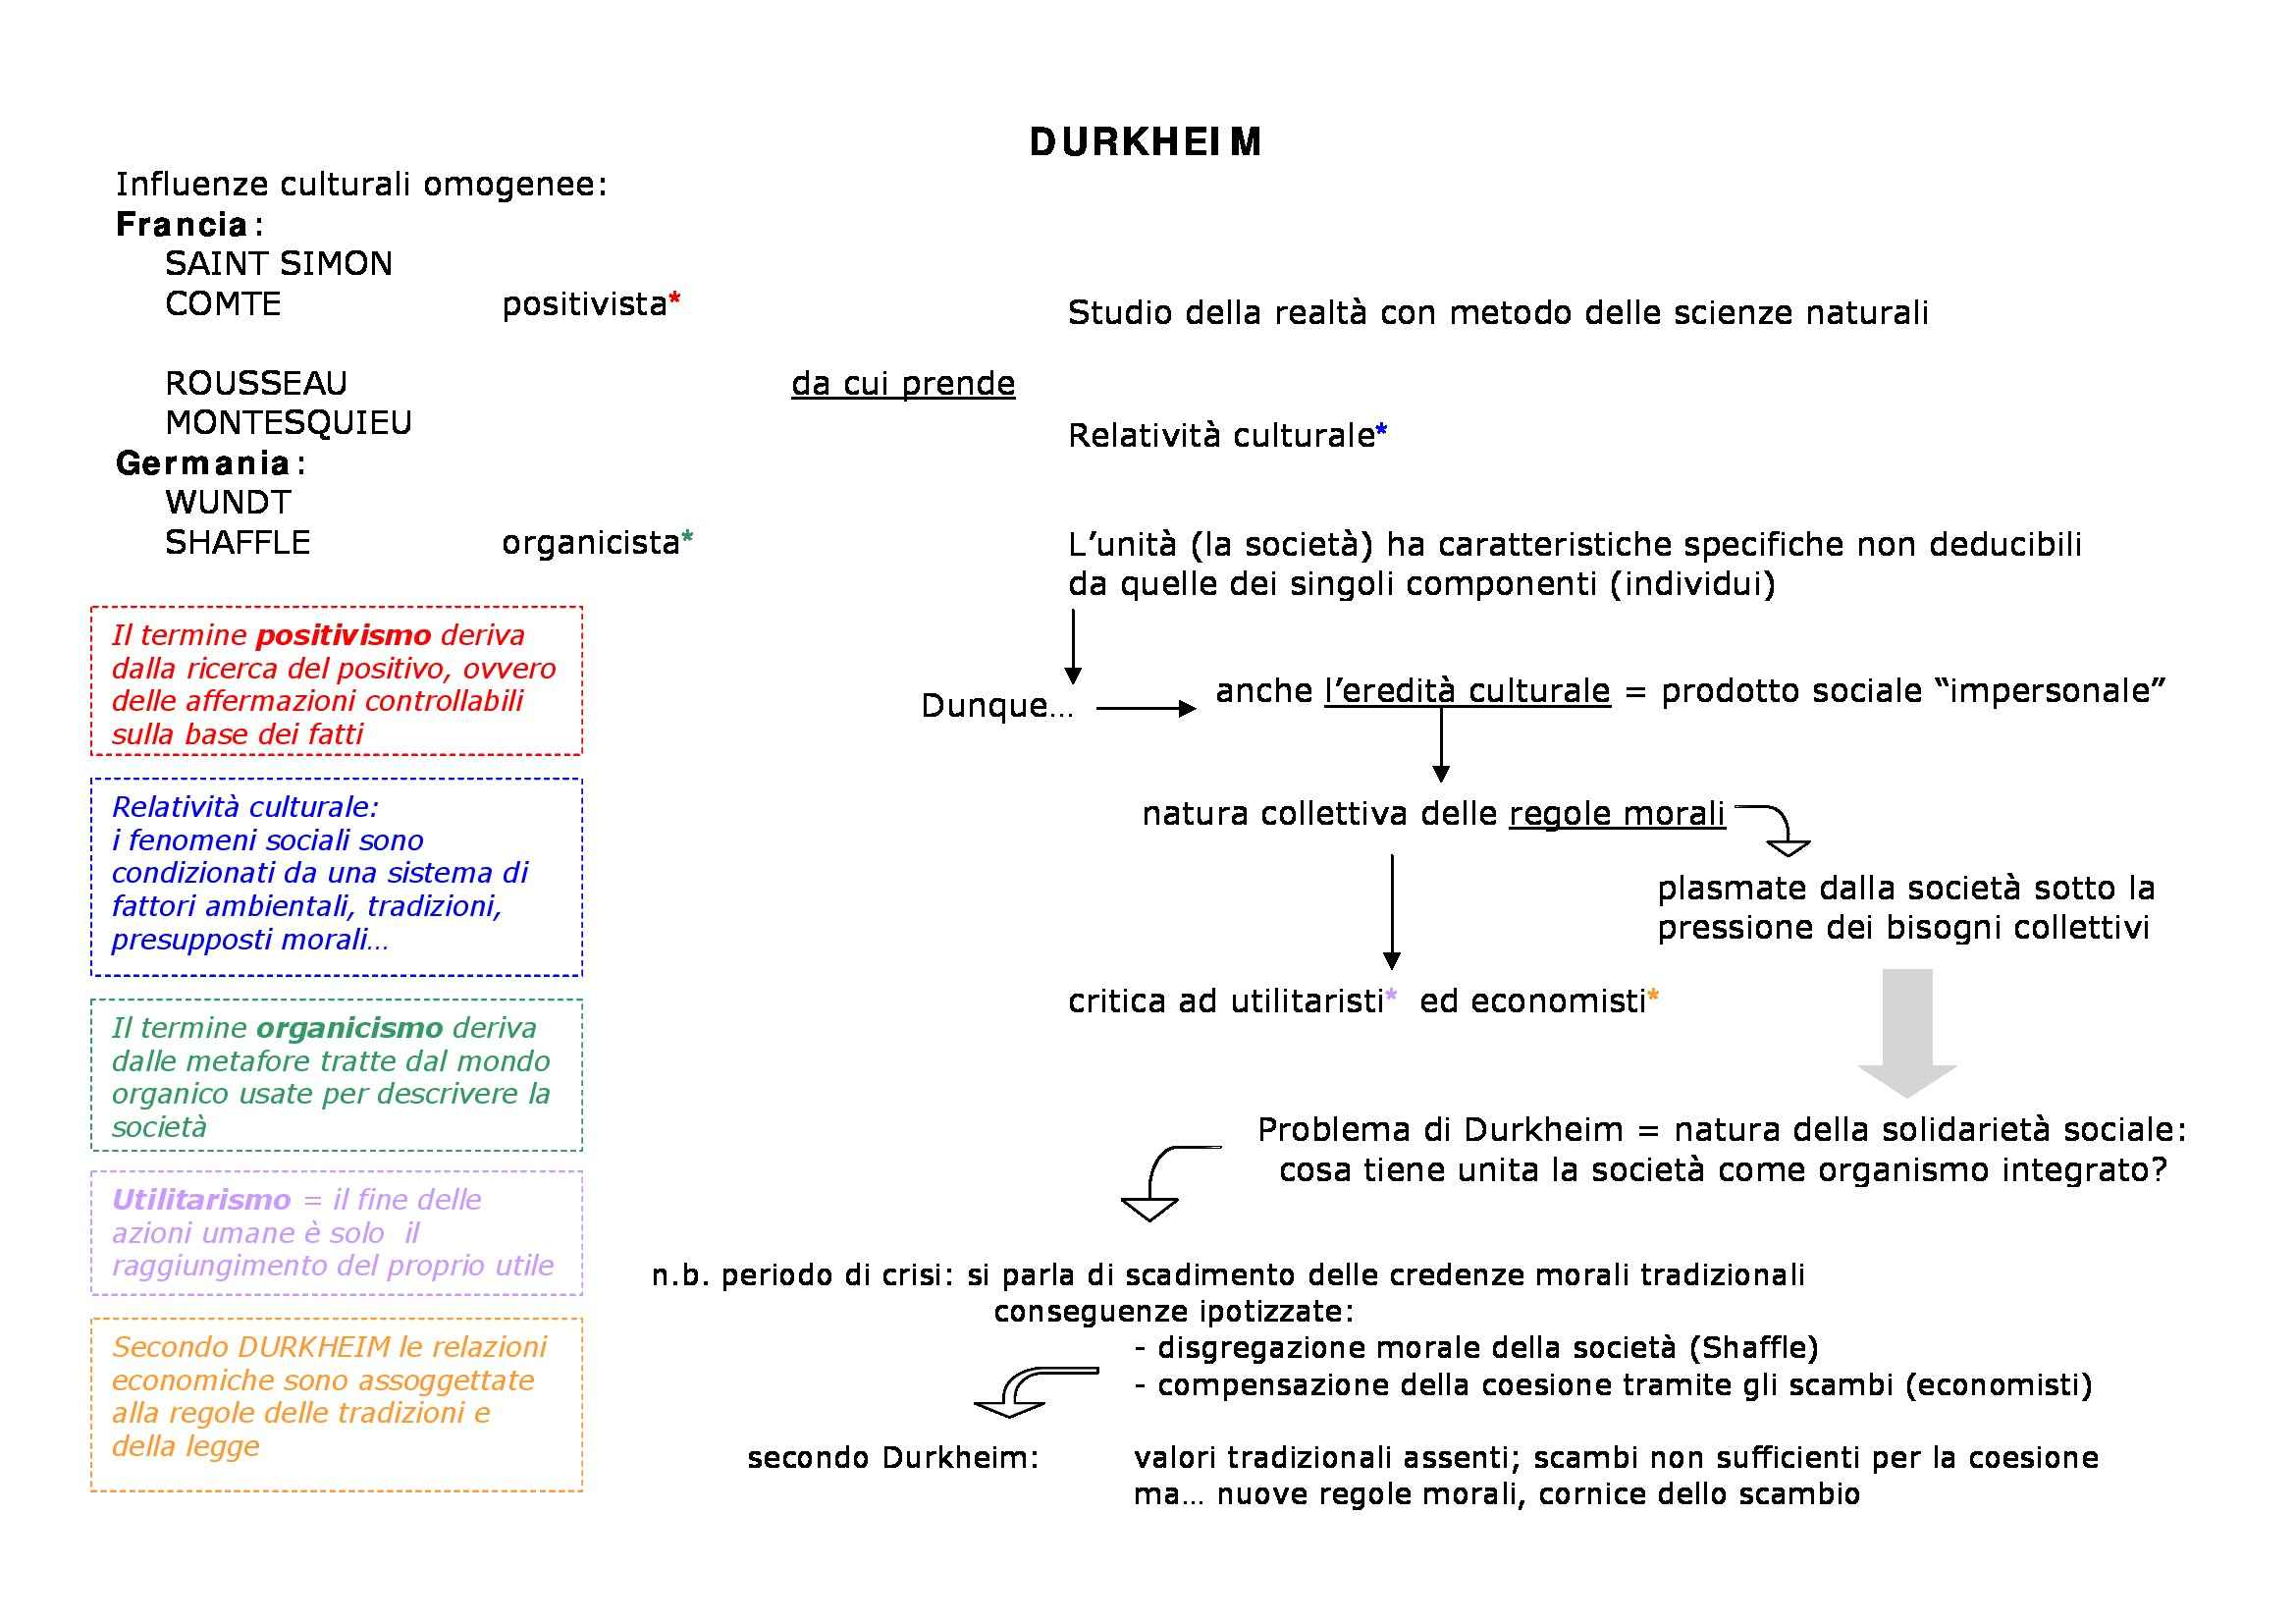 Durkheim, Emile - Mappa concettuale